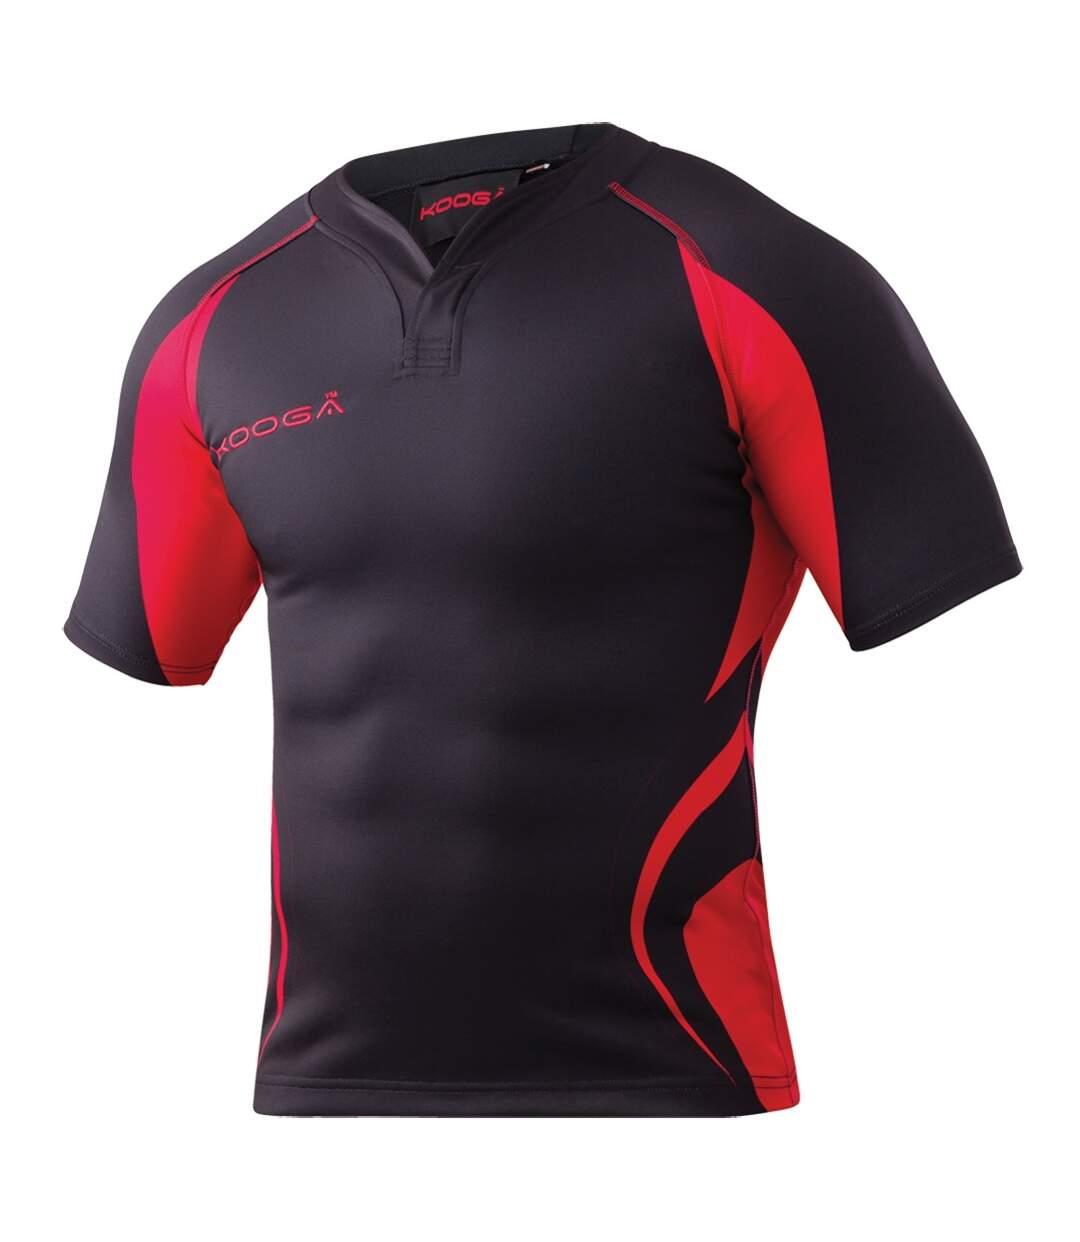 KooGa Mens Tight Fit Curve Premium Match Sports Shirt (Black / Gold) - UTRW2053